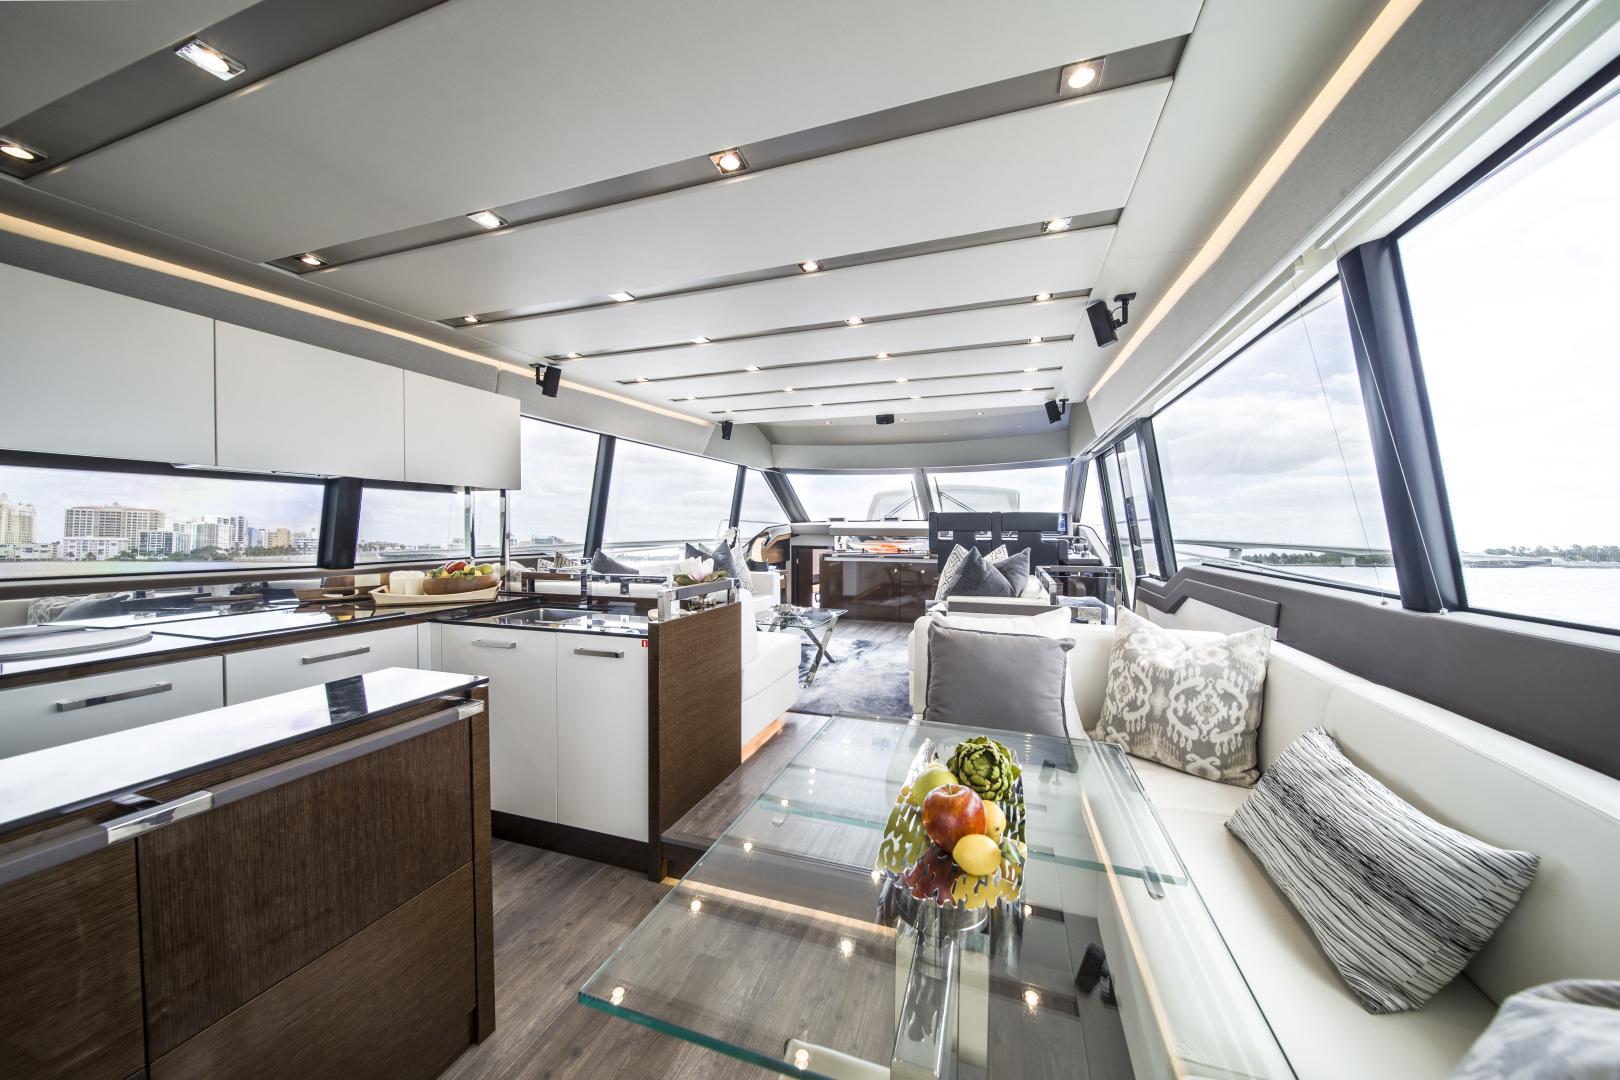 Prestige-680 Flybridge 2018-Seduction Sarasota-Florida-United States-2018 68 Prestige 680 Flybridge  Salon-1498916 | Thumbnail